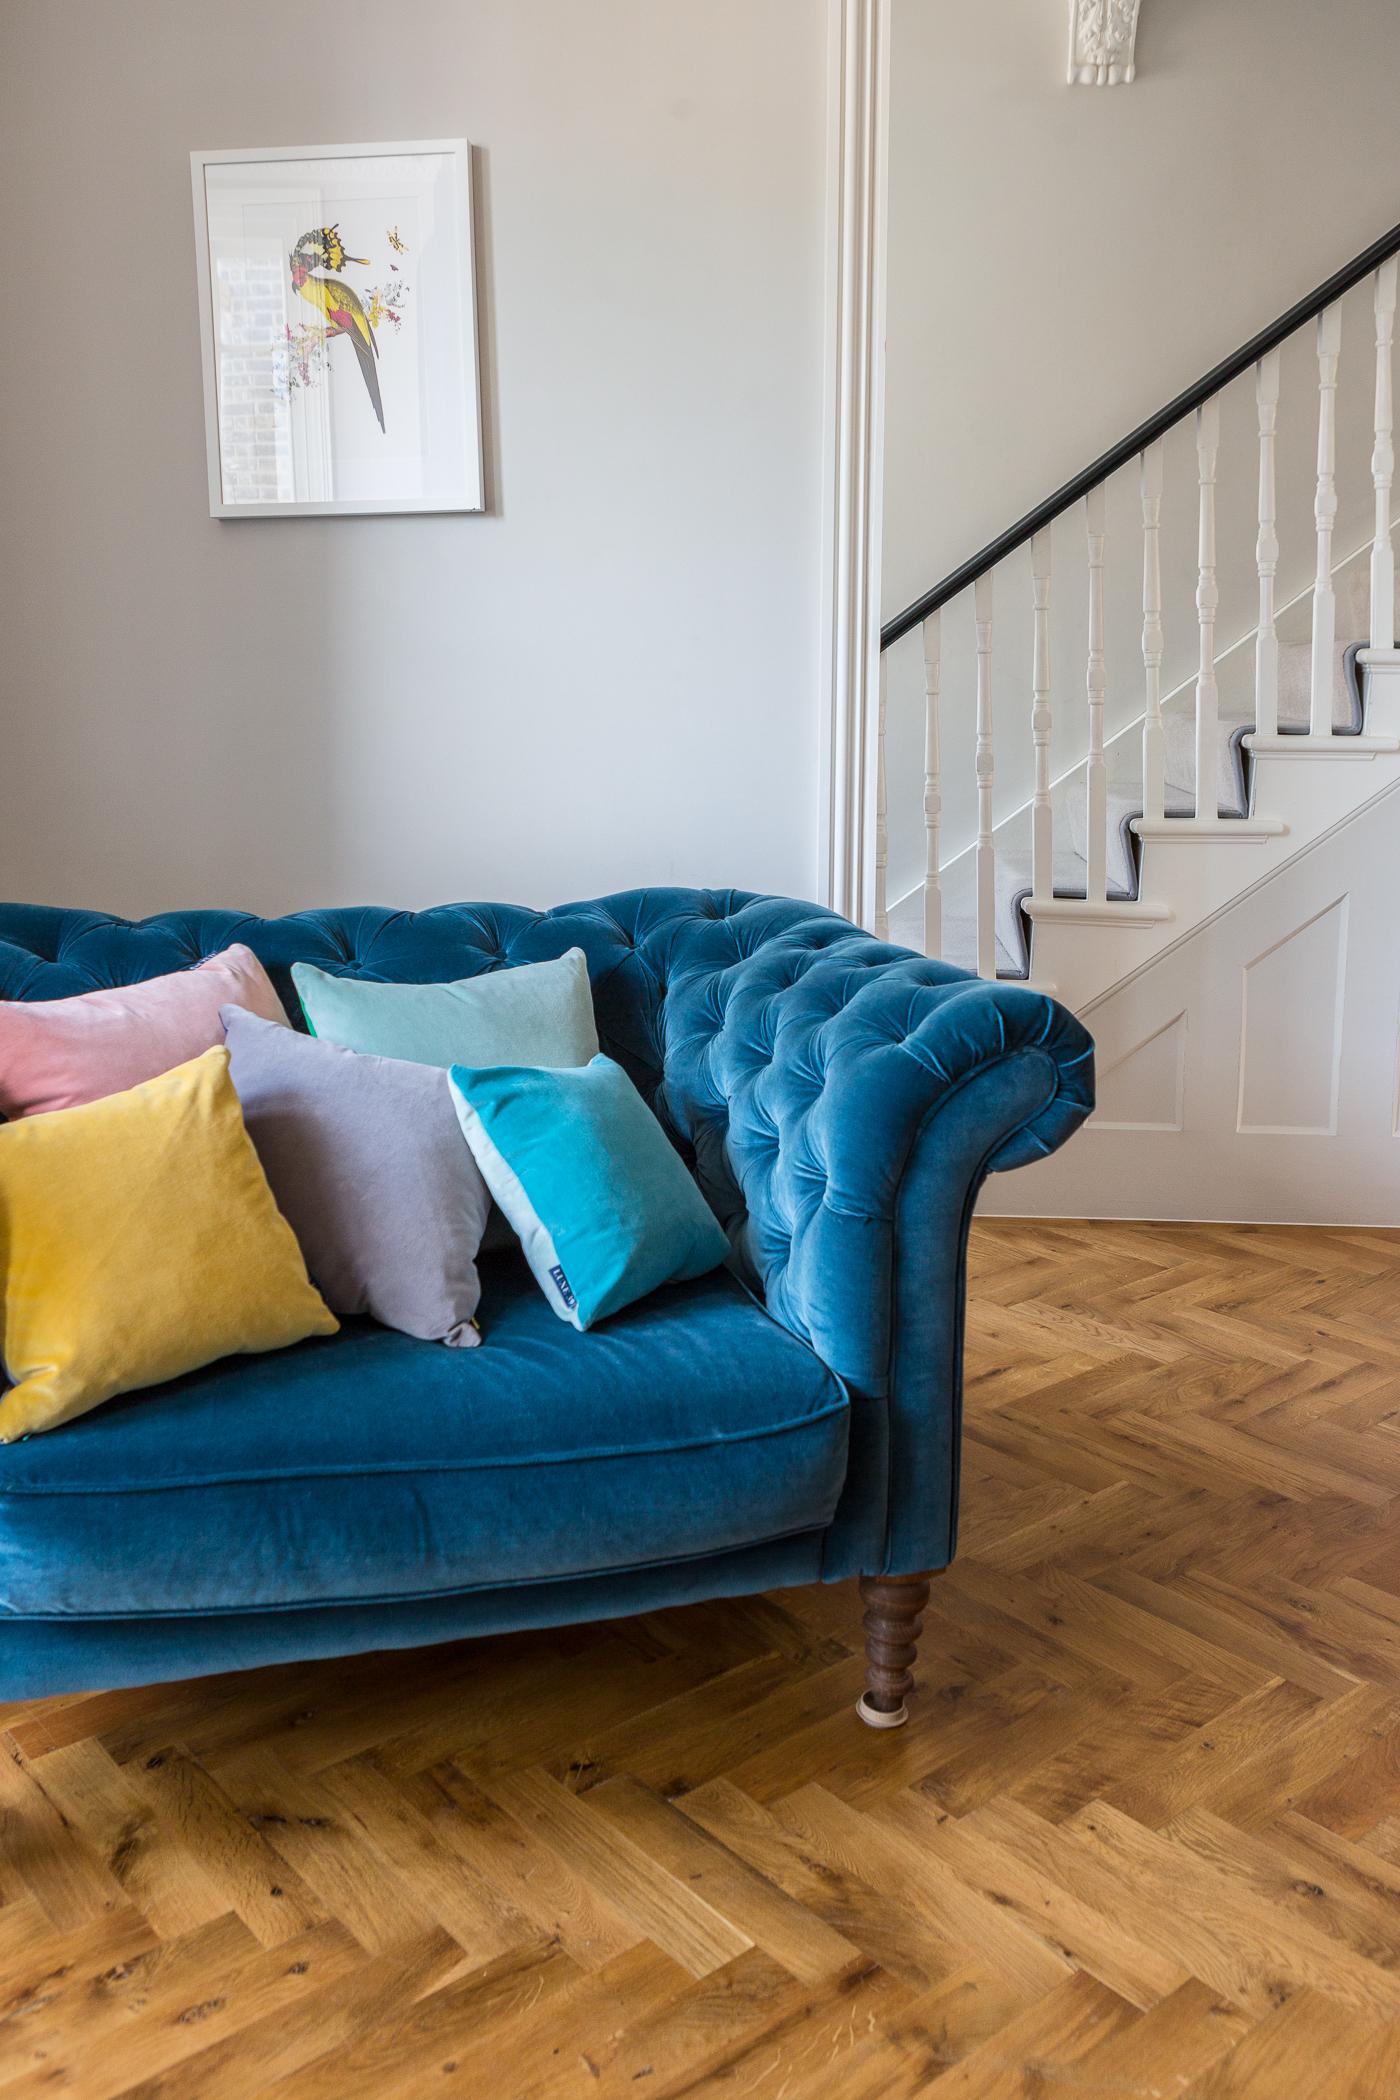 Teal chair with cushions copy.jpg